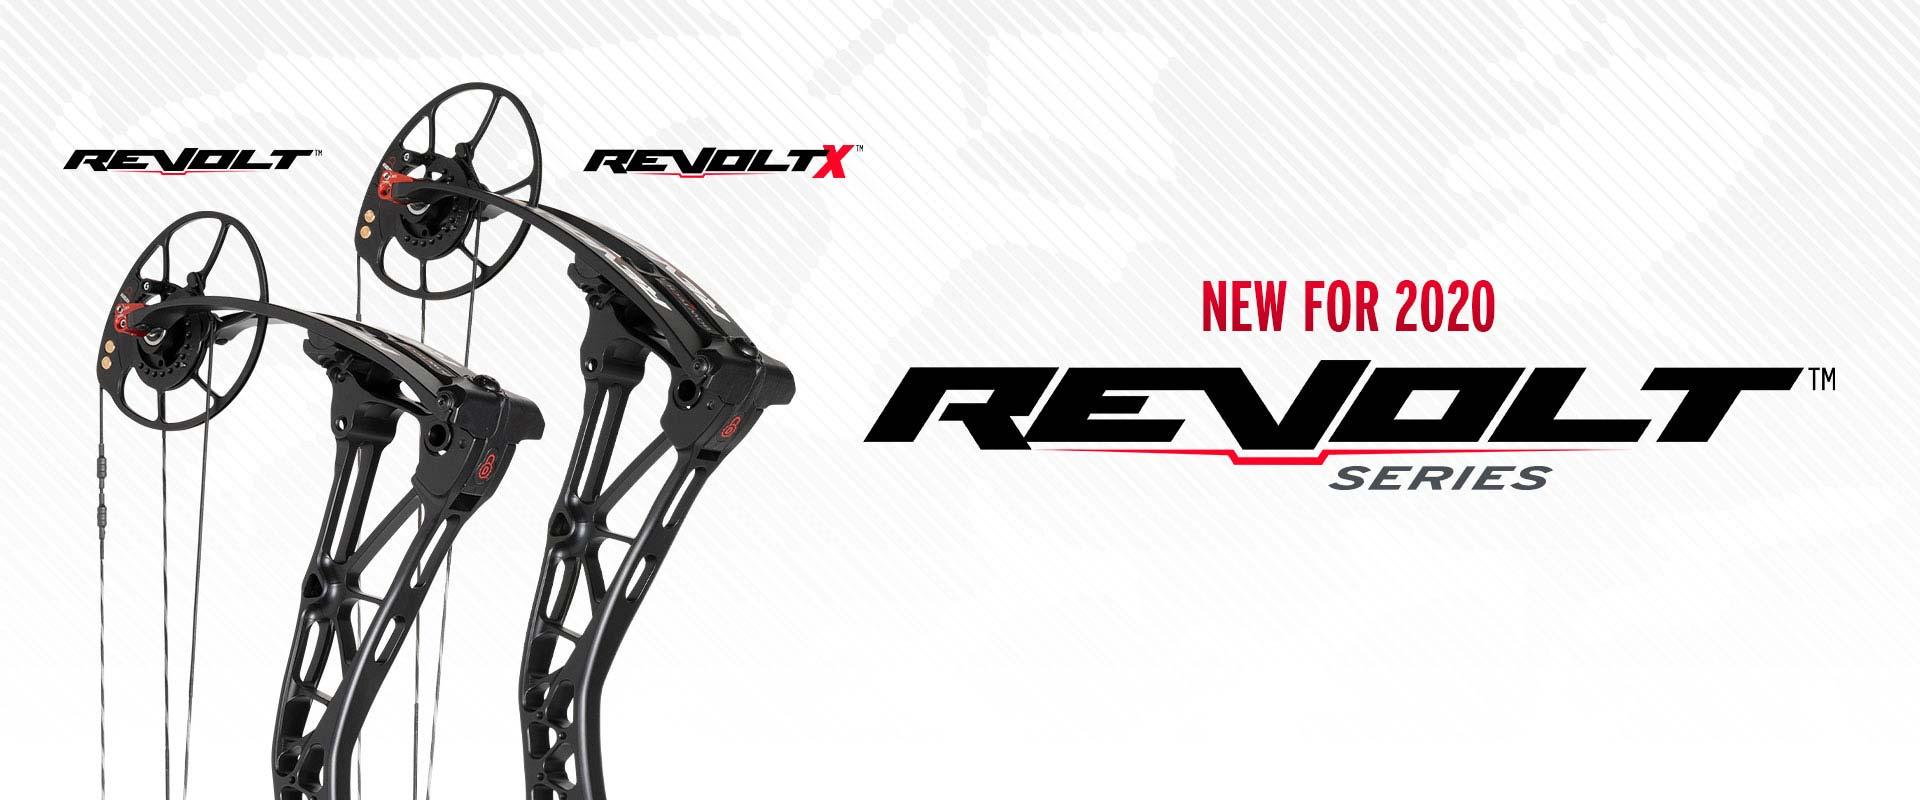 Bowtech 2020 Revolt Bow